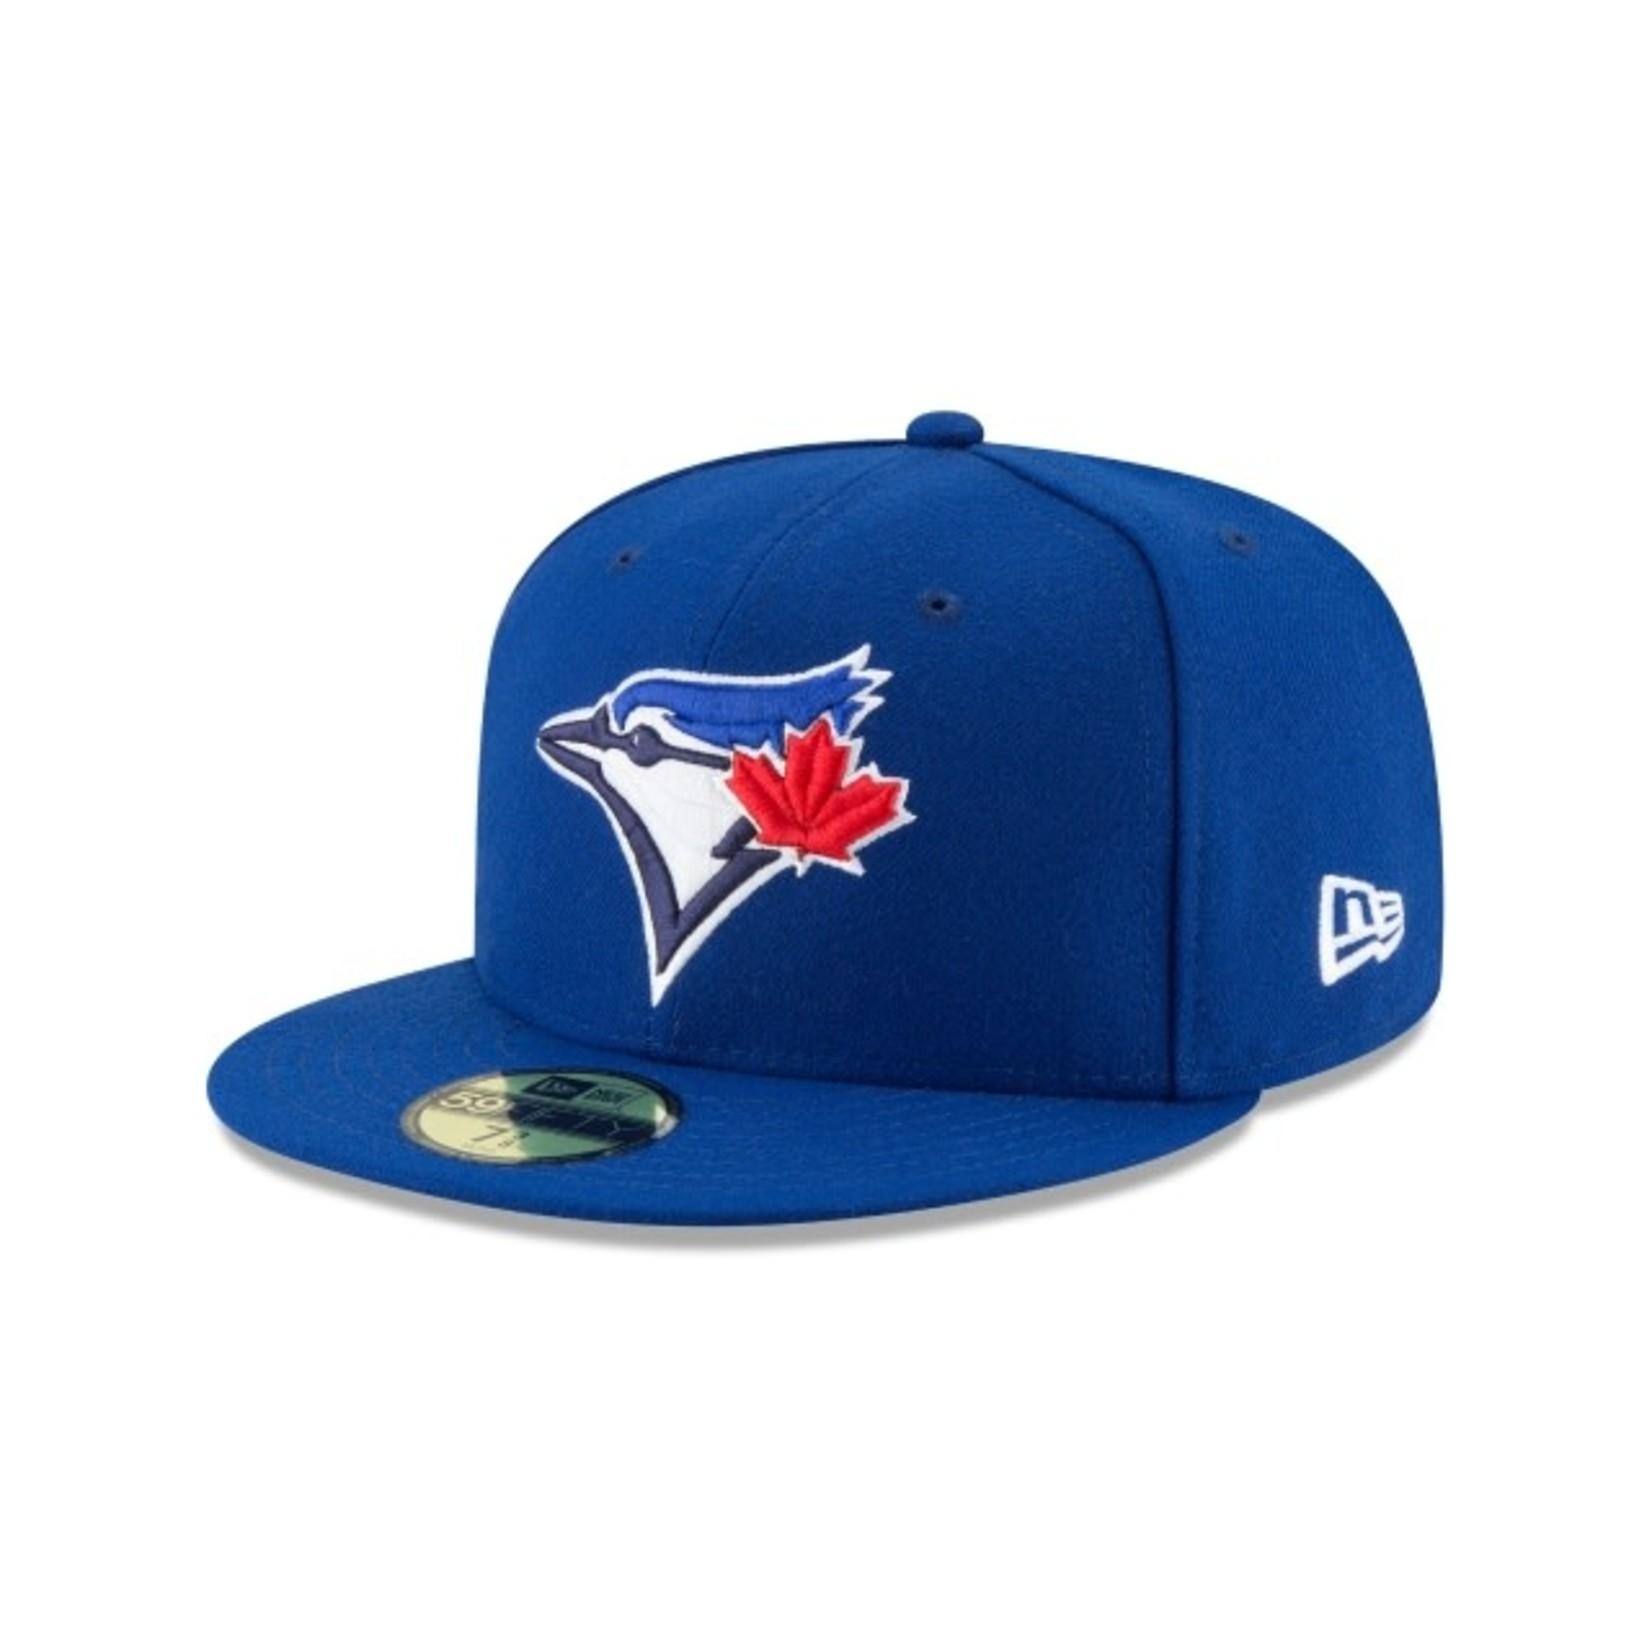 New Era New Era Hat, 59Fifty On-Field AC, MLB, Toronto Blue Jays Game